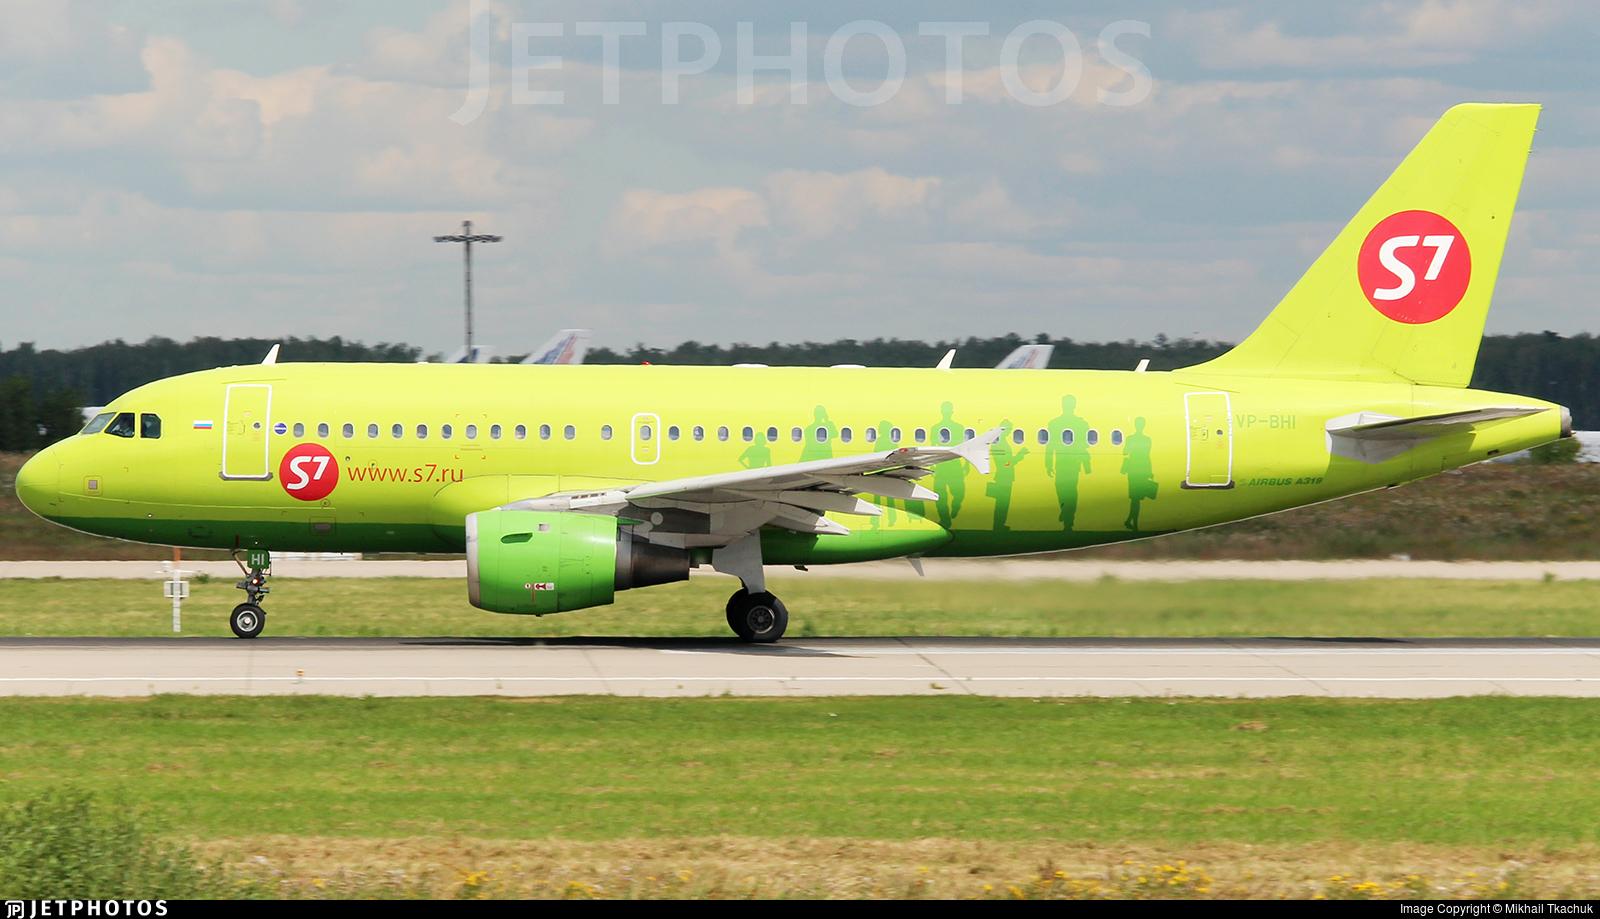 VP-BHI - Airbus A319-114 - S7 Airlines